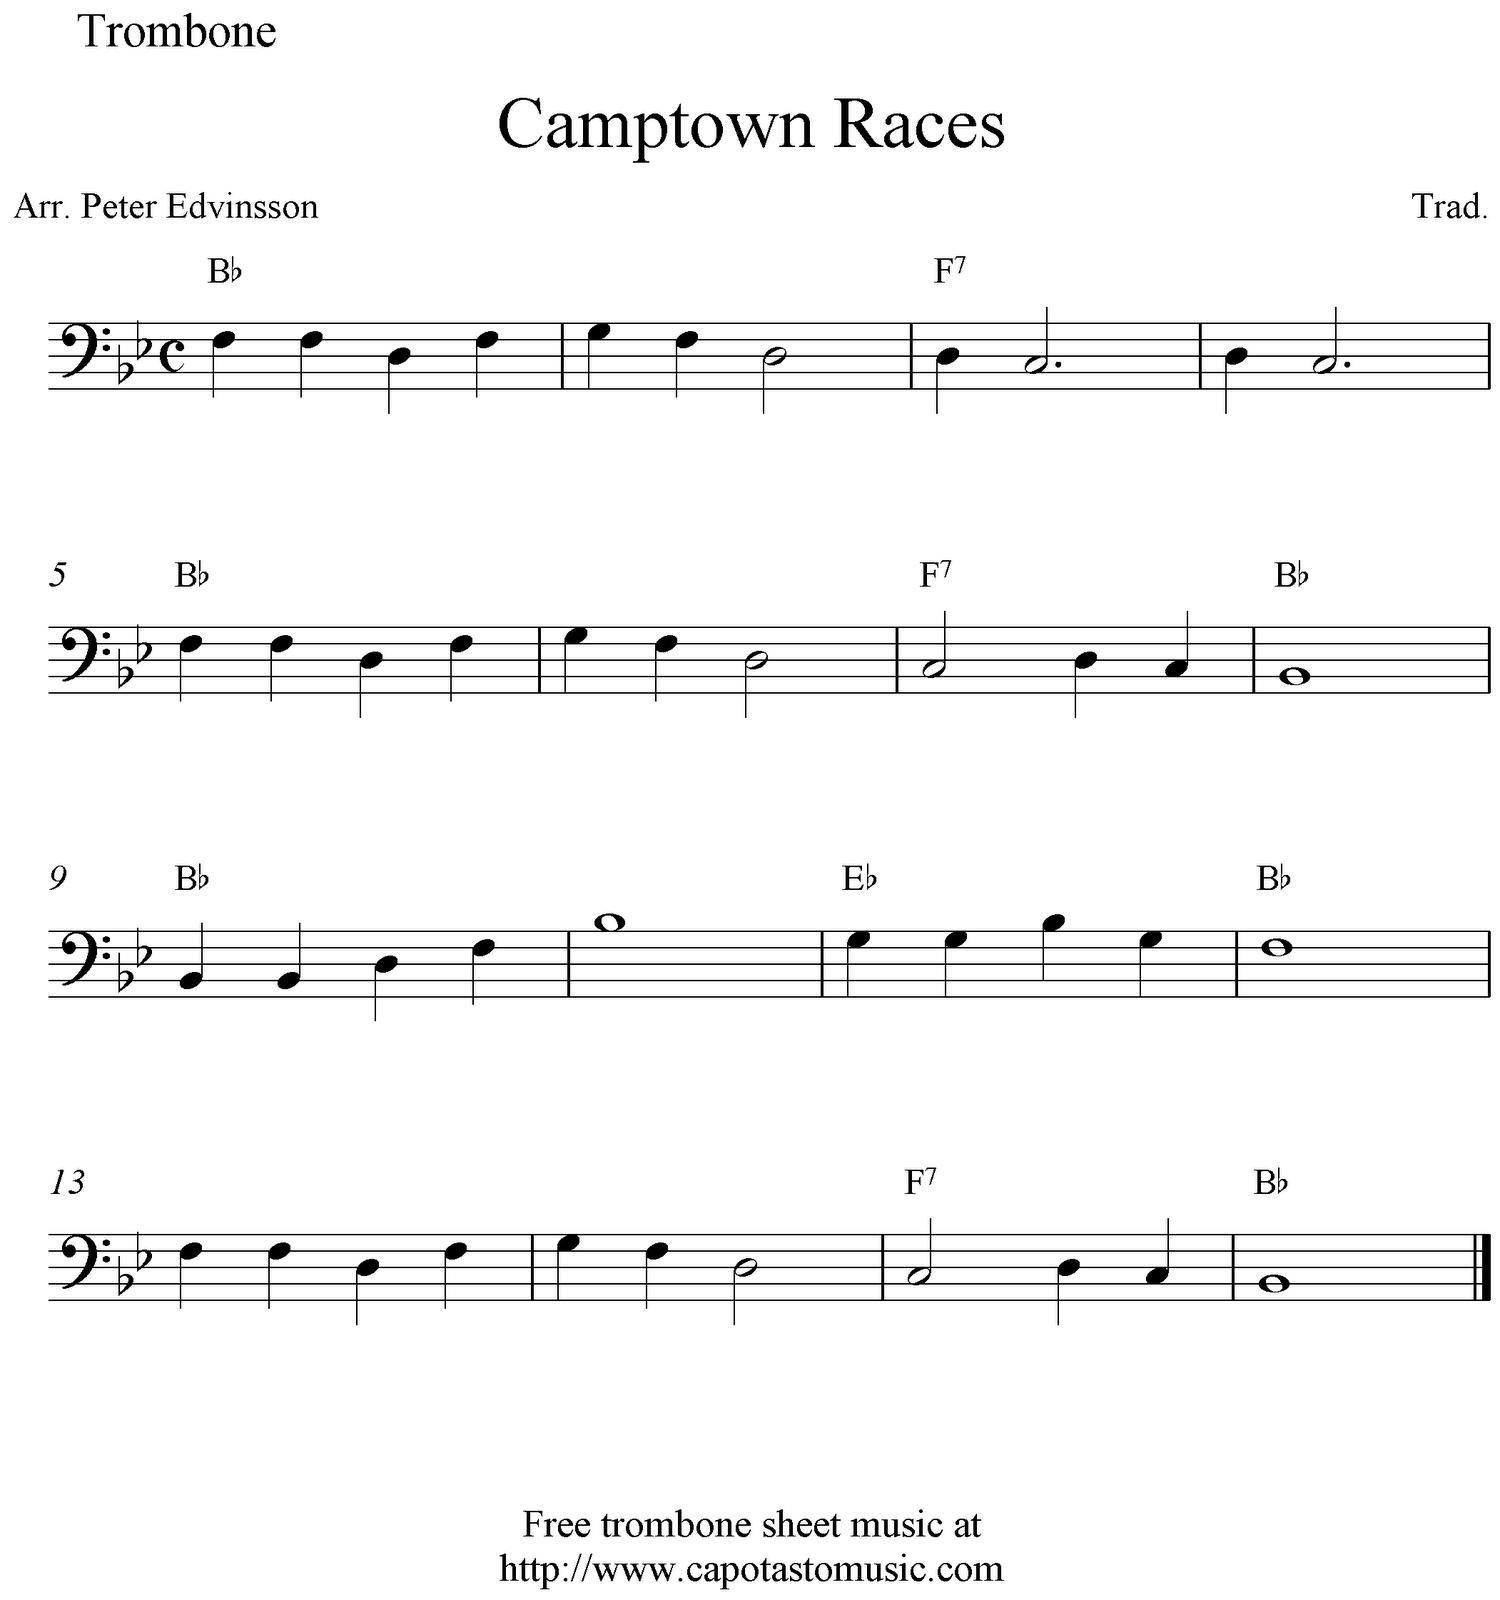 Camptown Races, Free Trombone Sheet Music